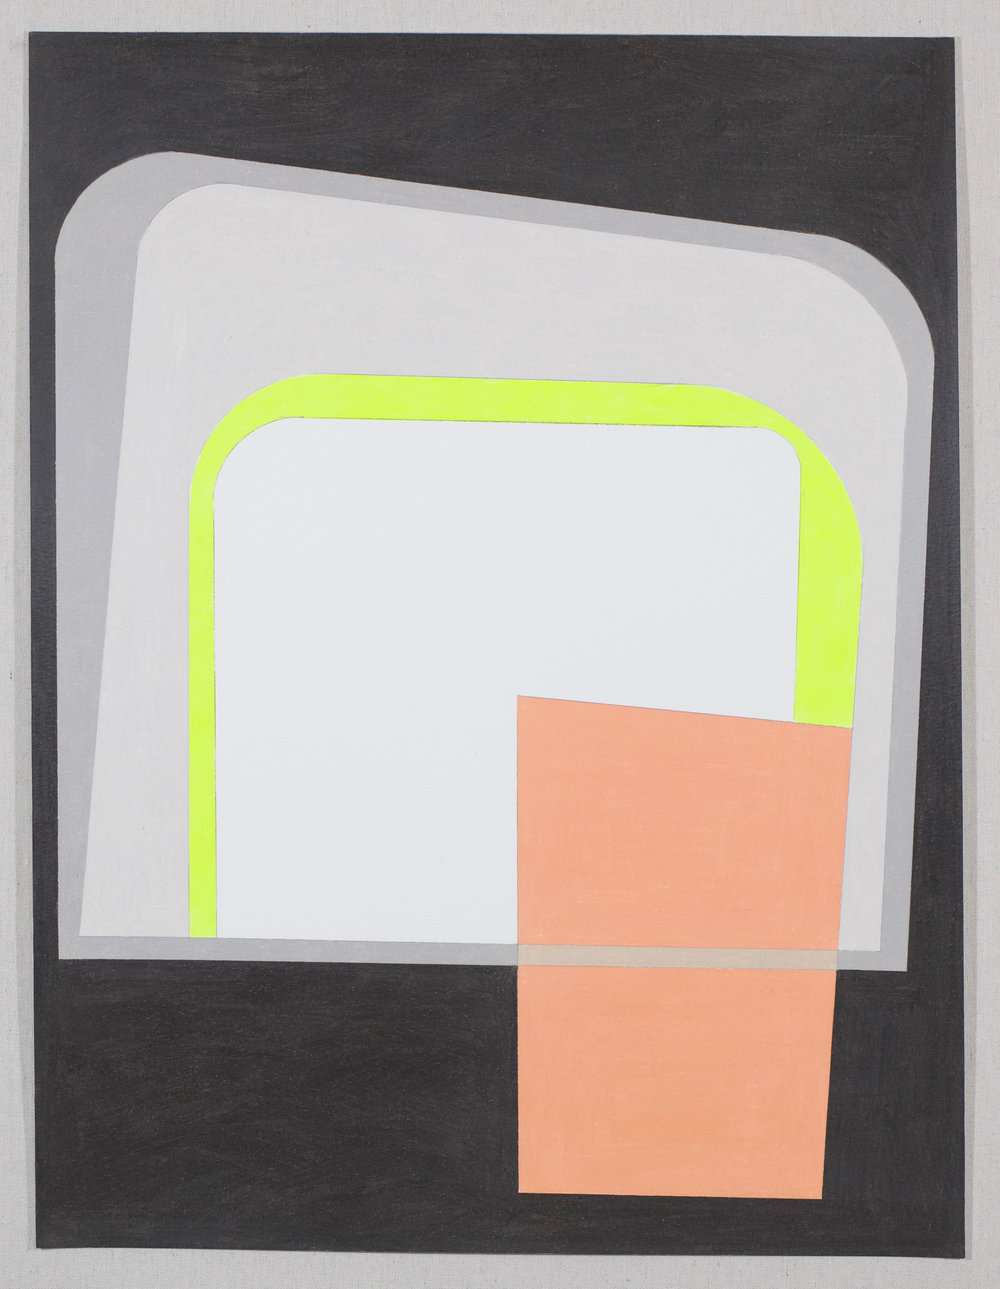 Untitled study #4, 2017